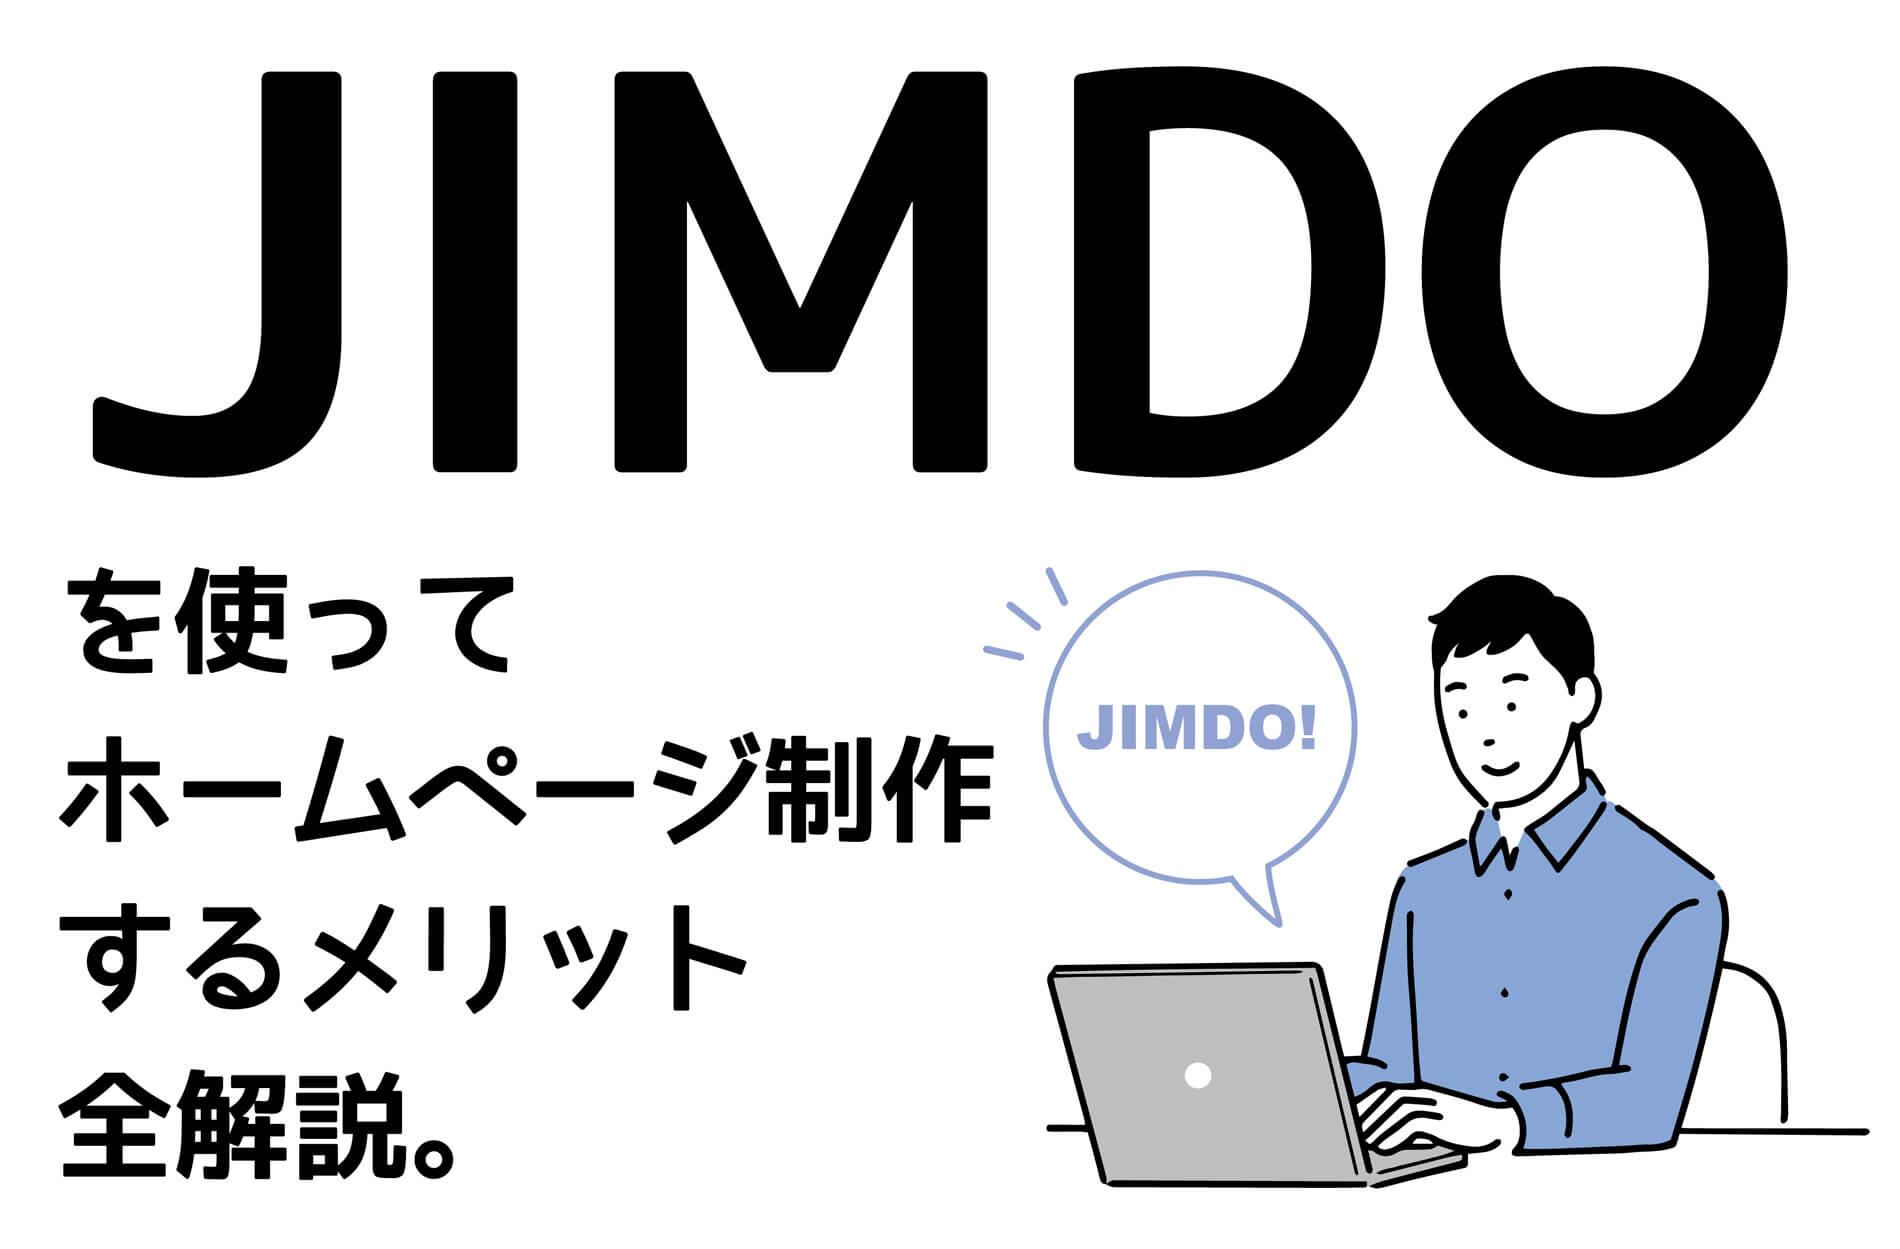 Jimdoホームページ制作/自分で更新・運営できるホームページ【中小企業・個人事業主の皆さんに】